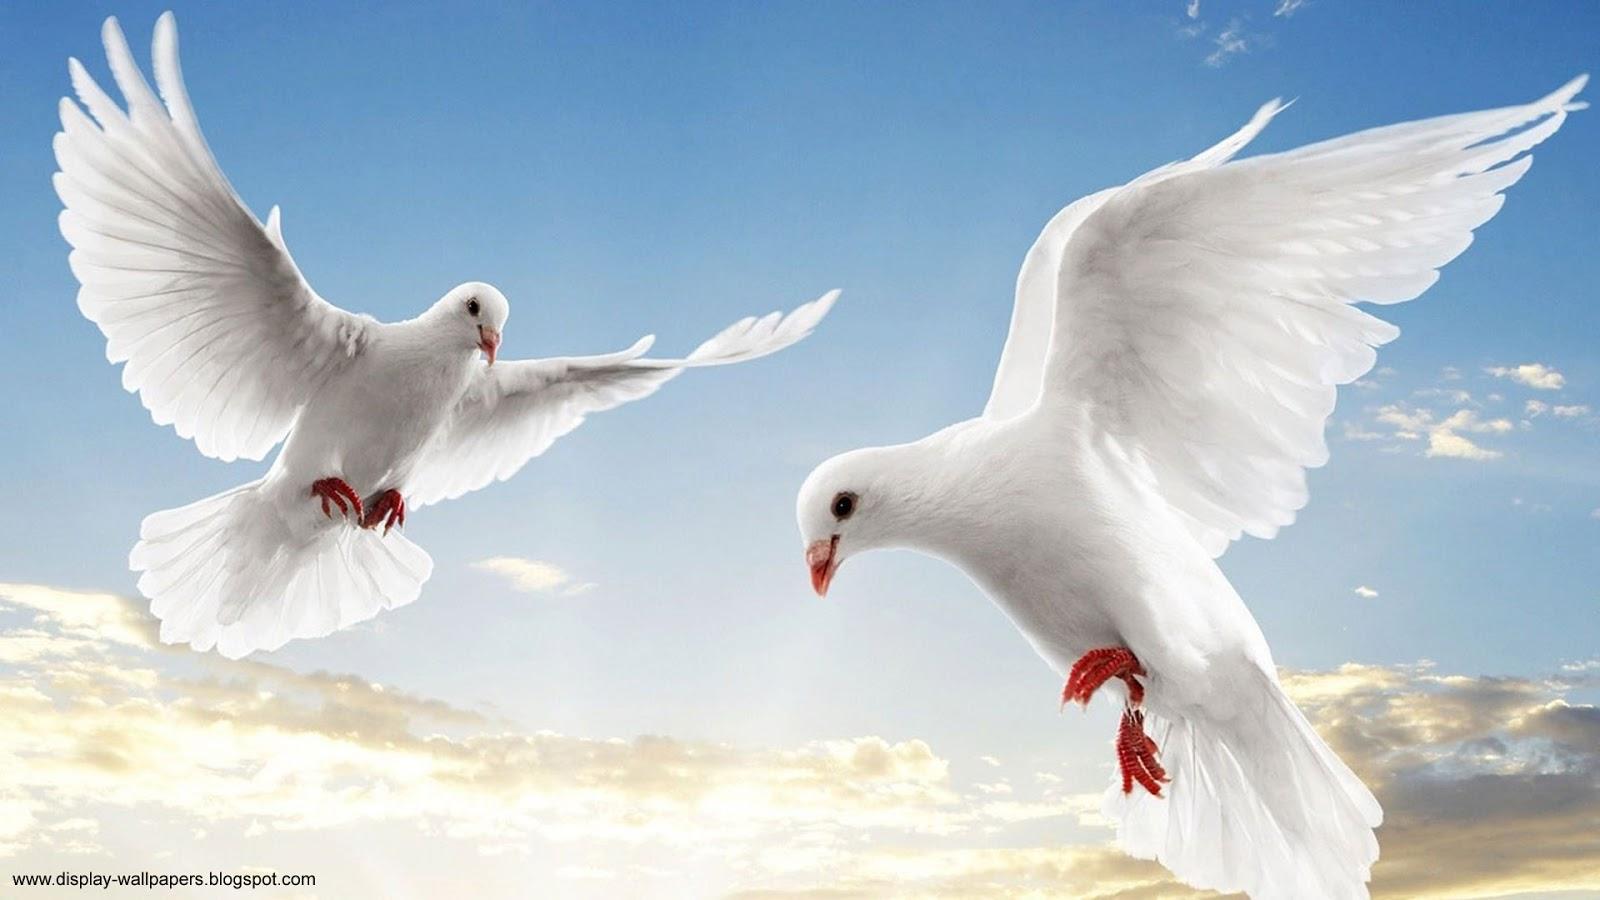 Animals Wallpaper Hd 1080p | Download Wallpaper,Desktop ...